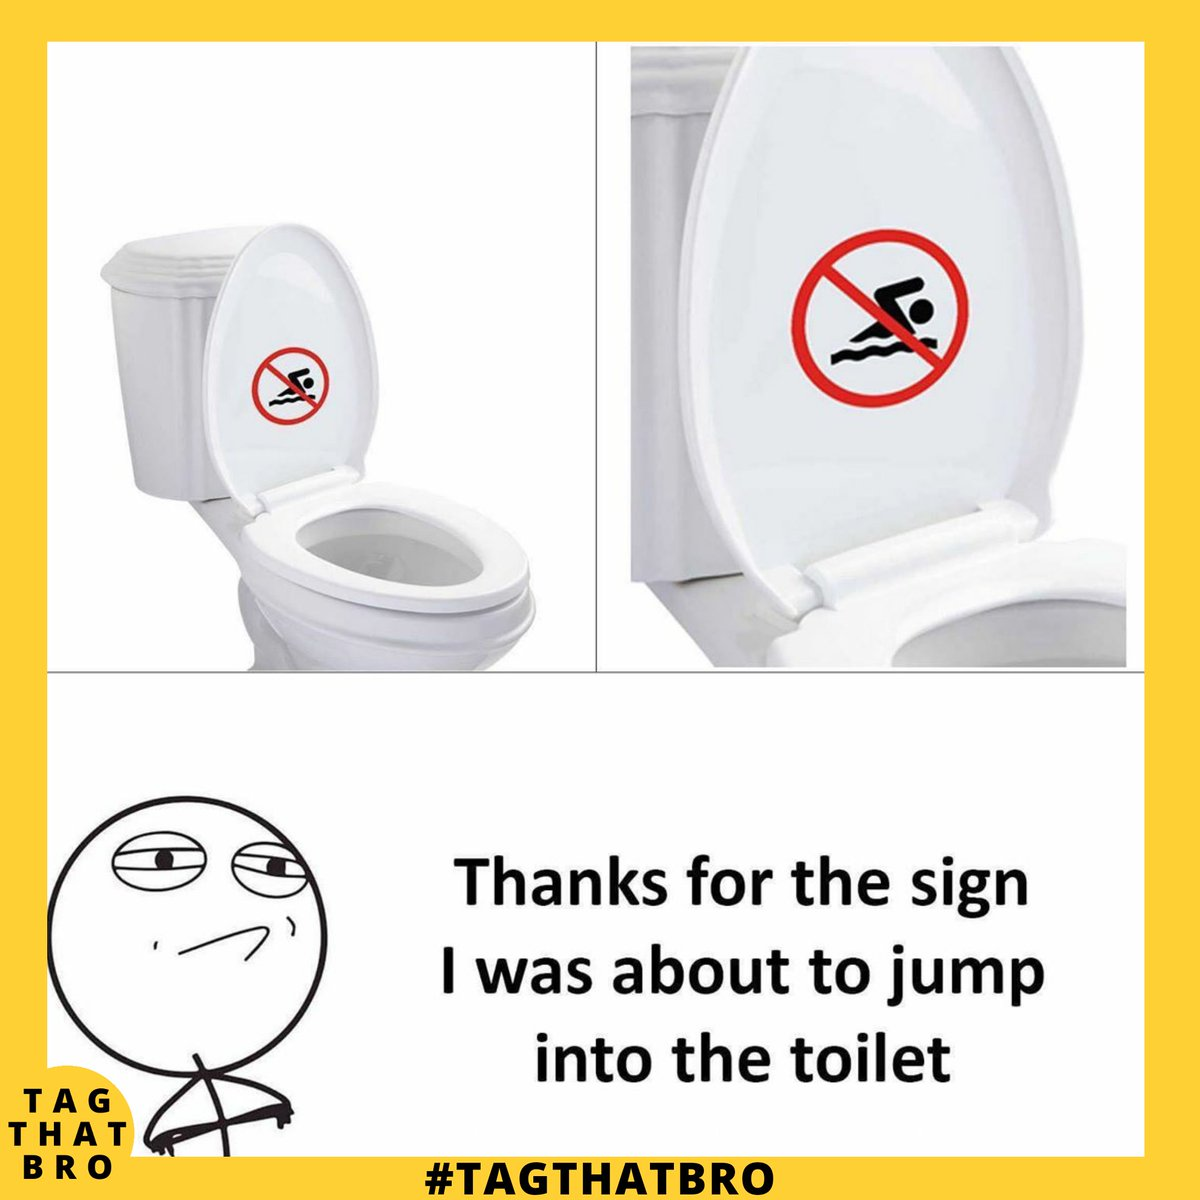 Tag That Bro - Follow us @tagthatbro  #tagthatbro #memes#dankmemes #memes#memesdaily #memesespanol #memestagram #funnymemes #edgymemes #memester #memesdank #memesfordays #memeschile #memesfunny #dailymemes #memess #memestar #memestagram #memesrlife #memesquad pic.twitter.com/vcXGguAc1L